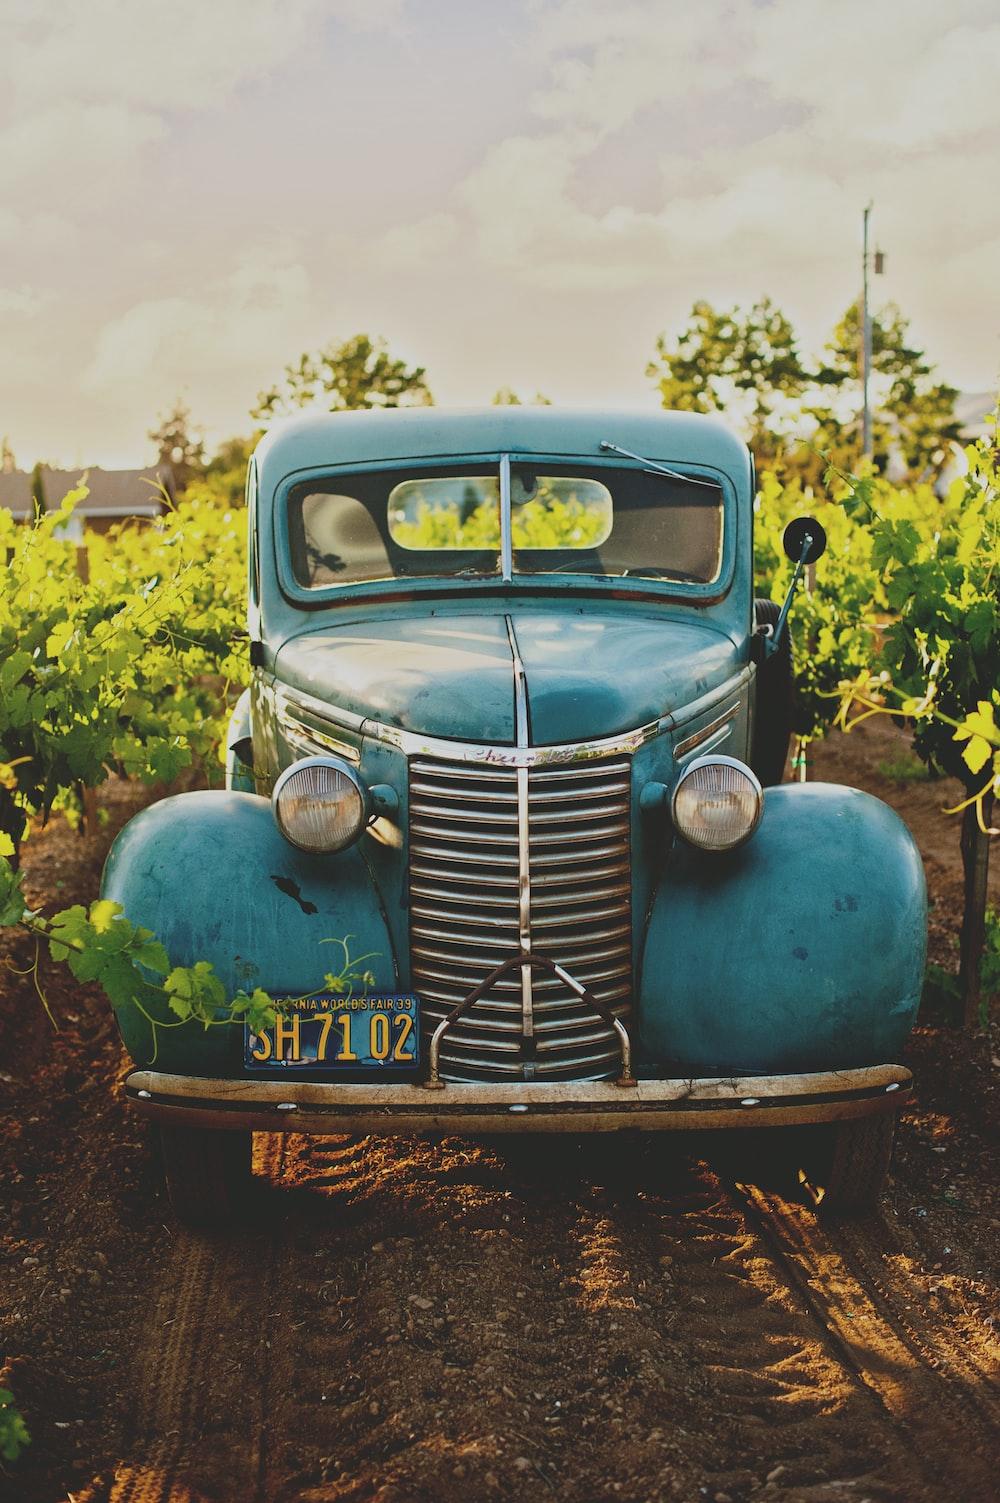 Old Chevy Trucks: Top Six Trucks